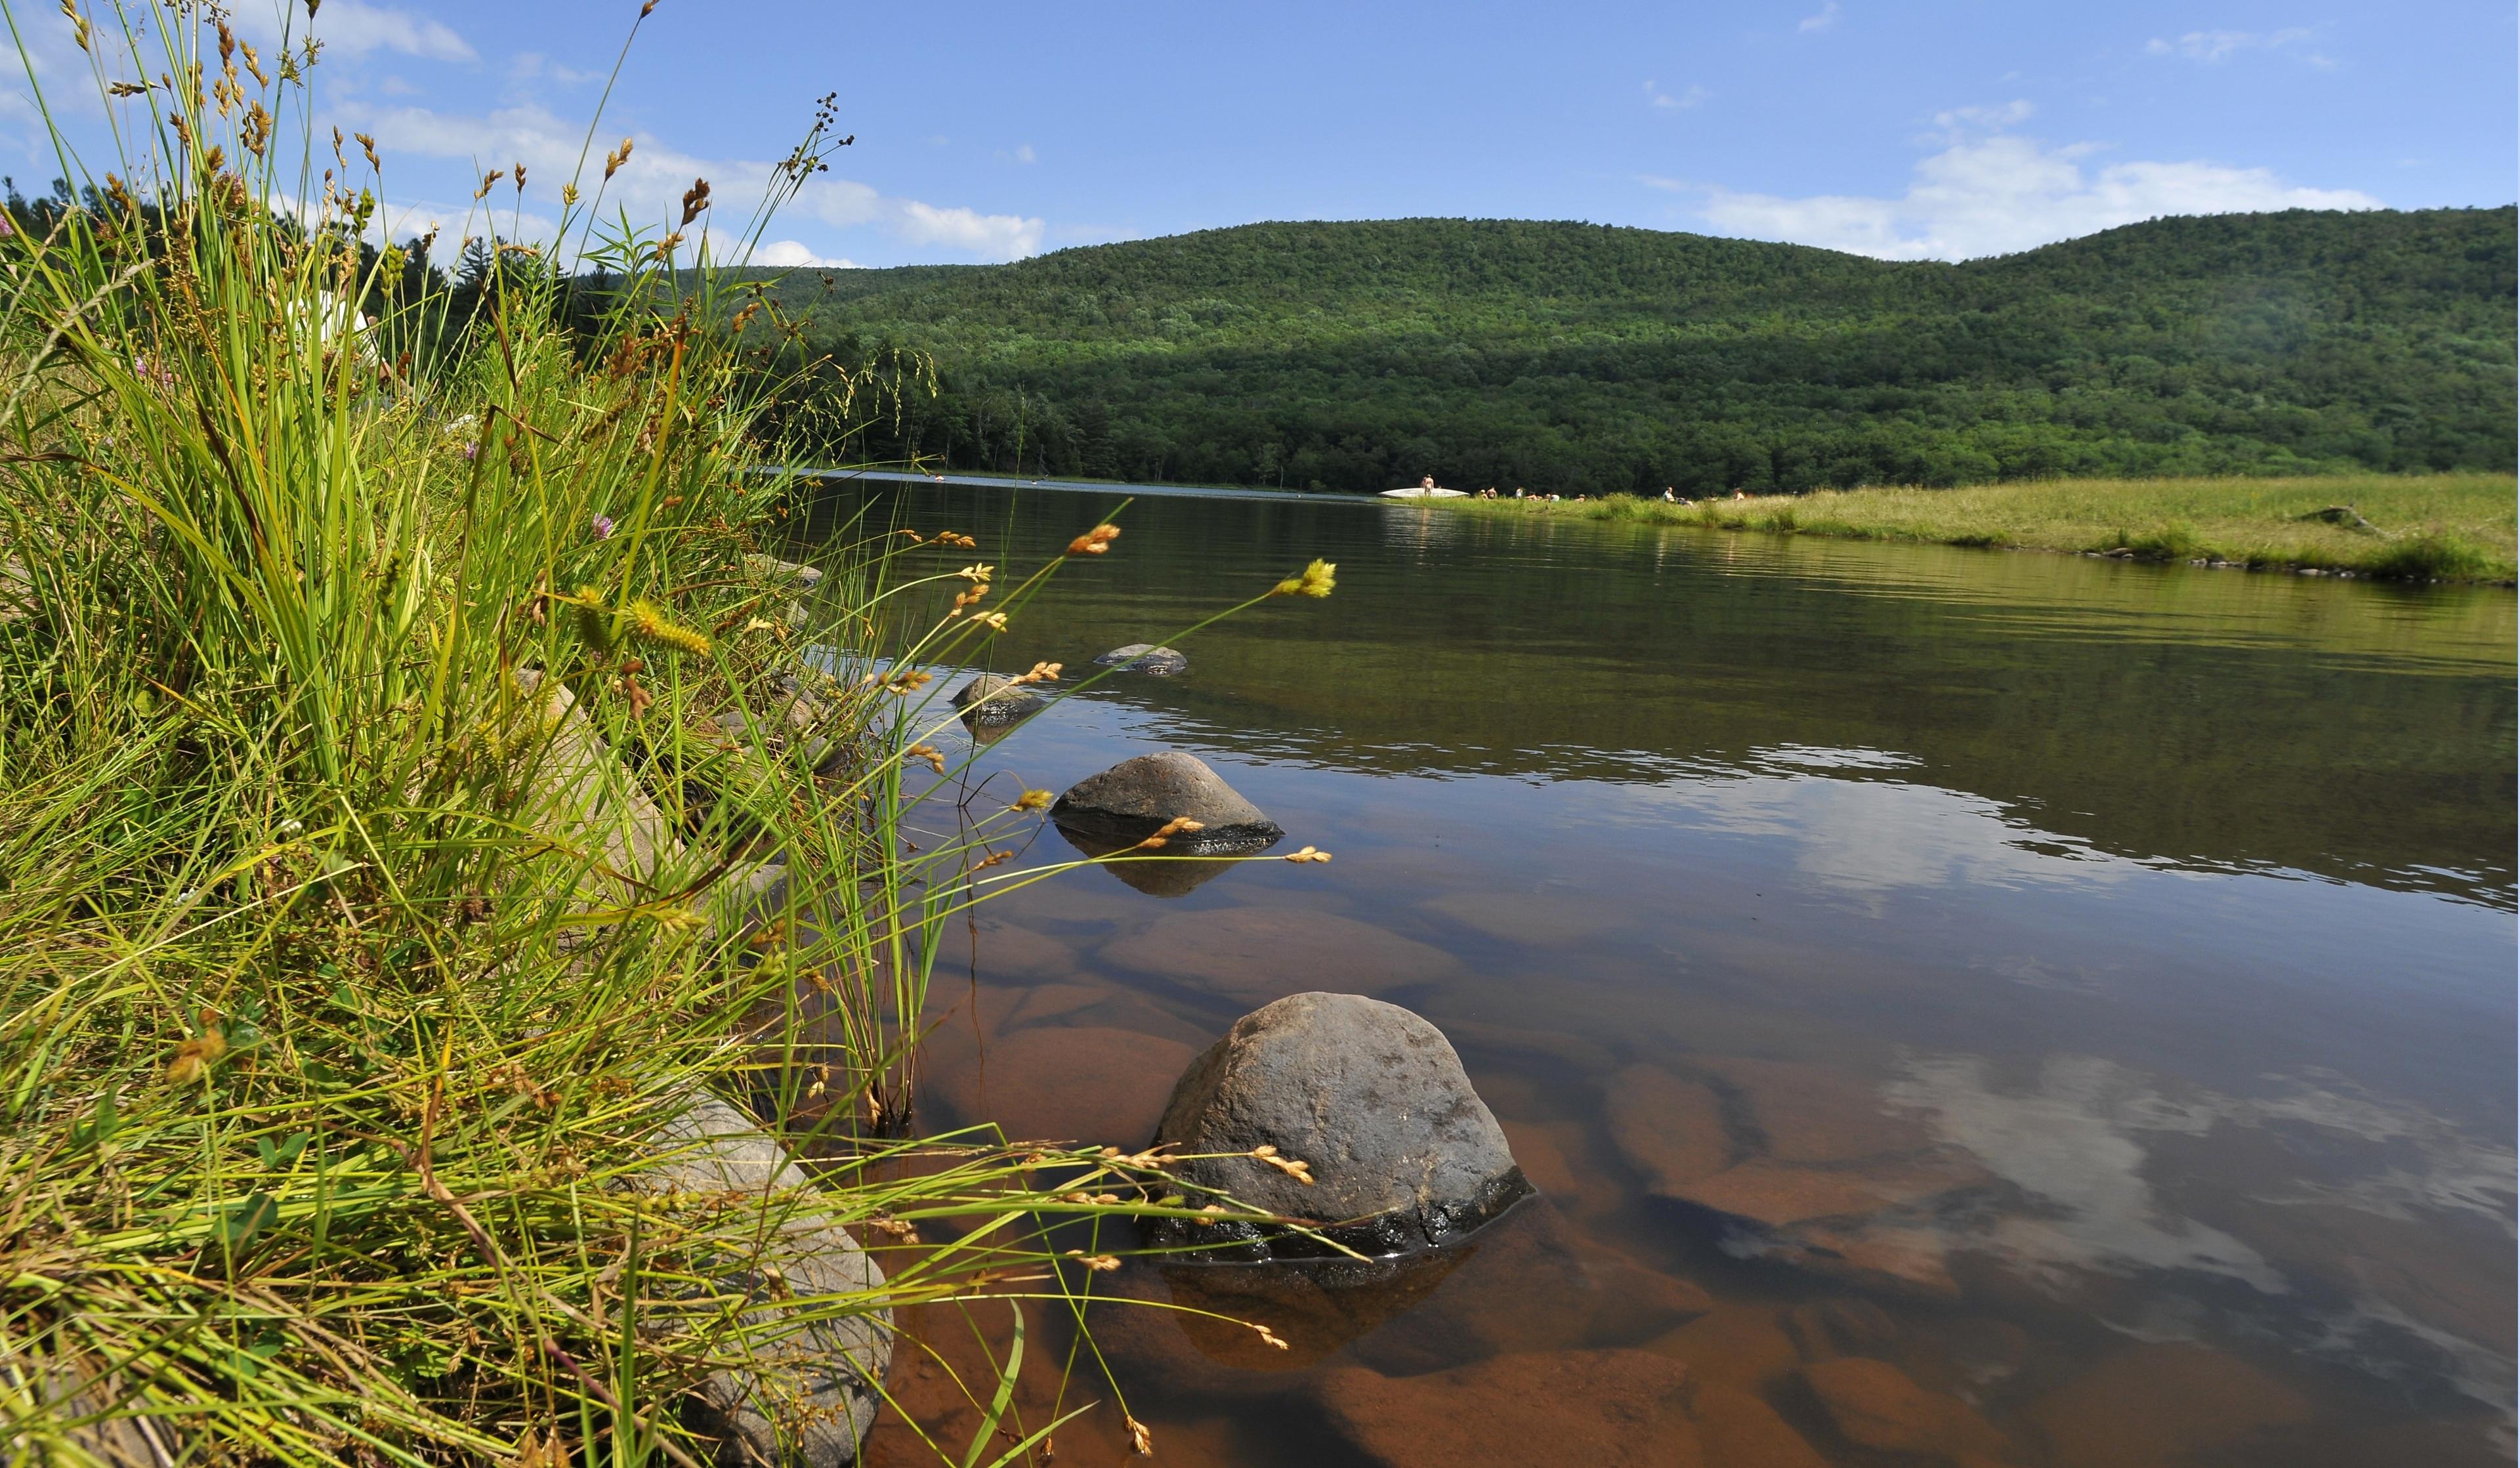 Catskill, New York, United States of America